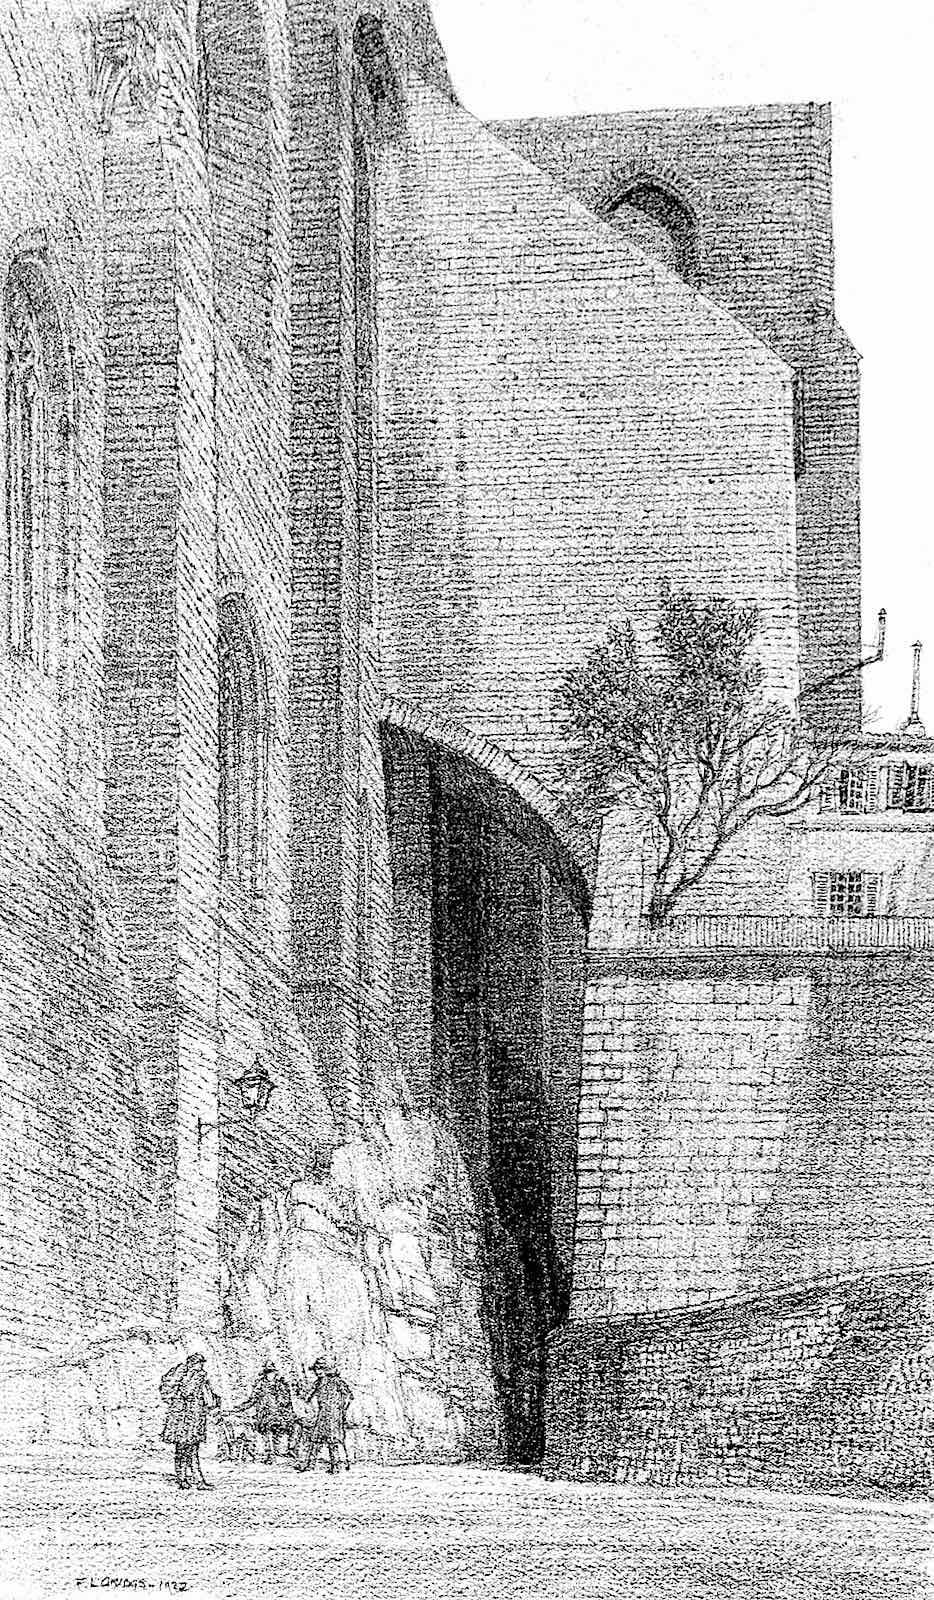 F.L. Griggs, a tree among bricks